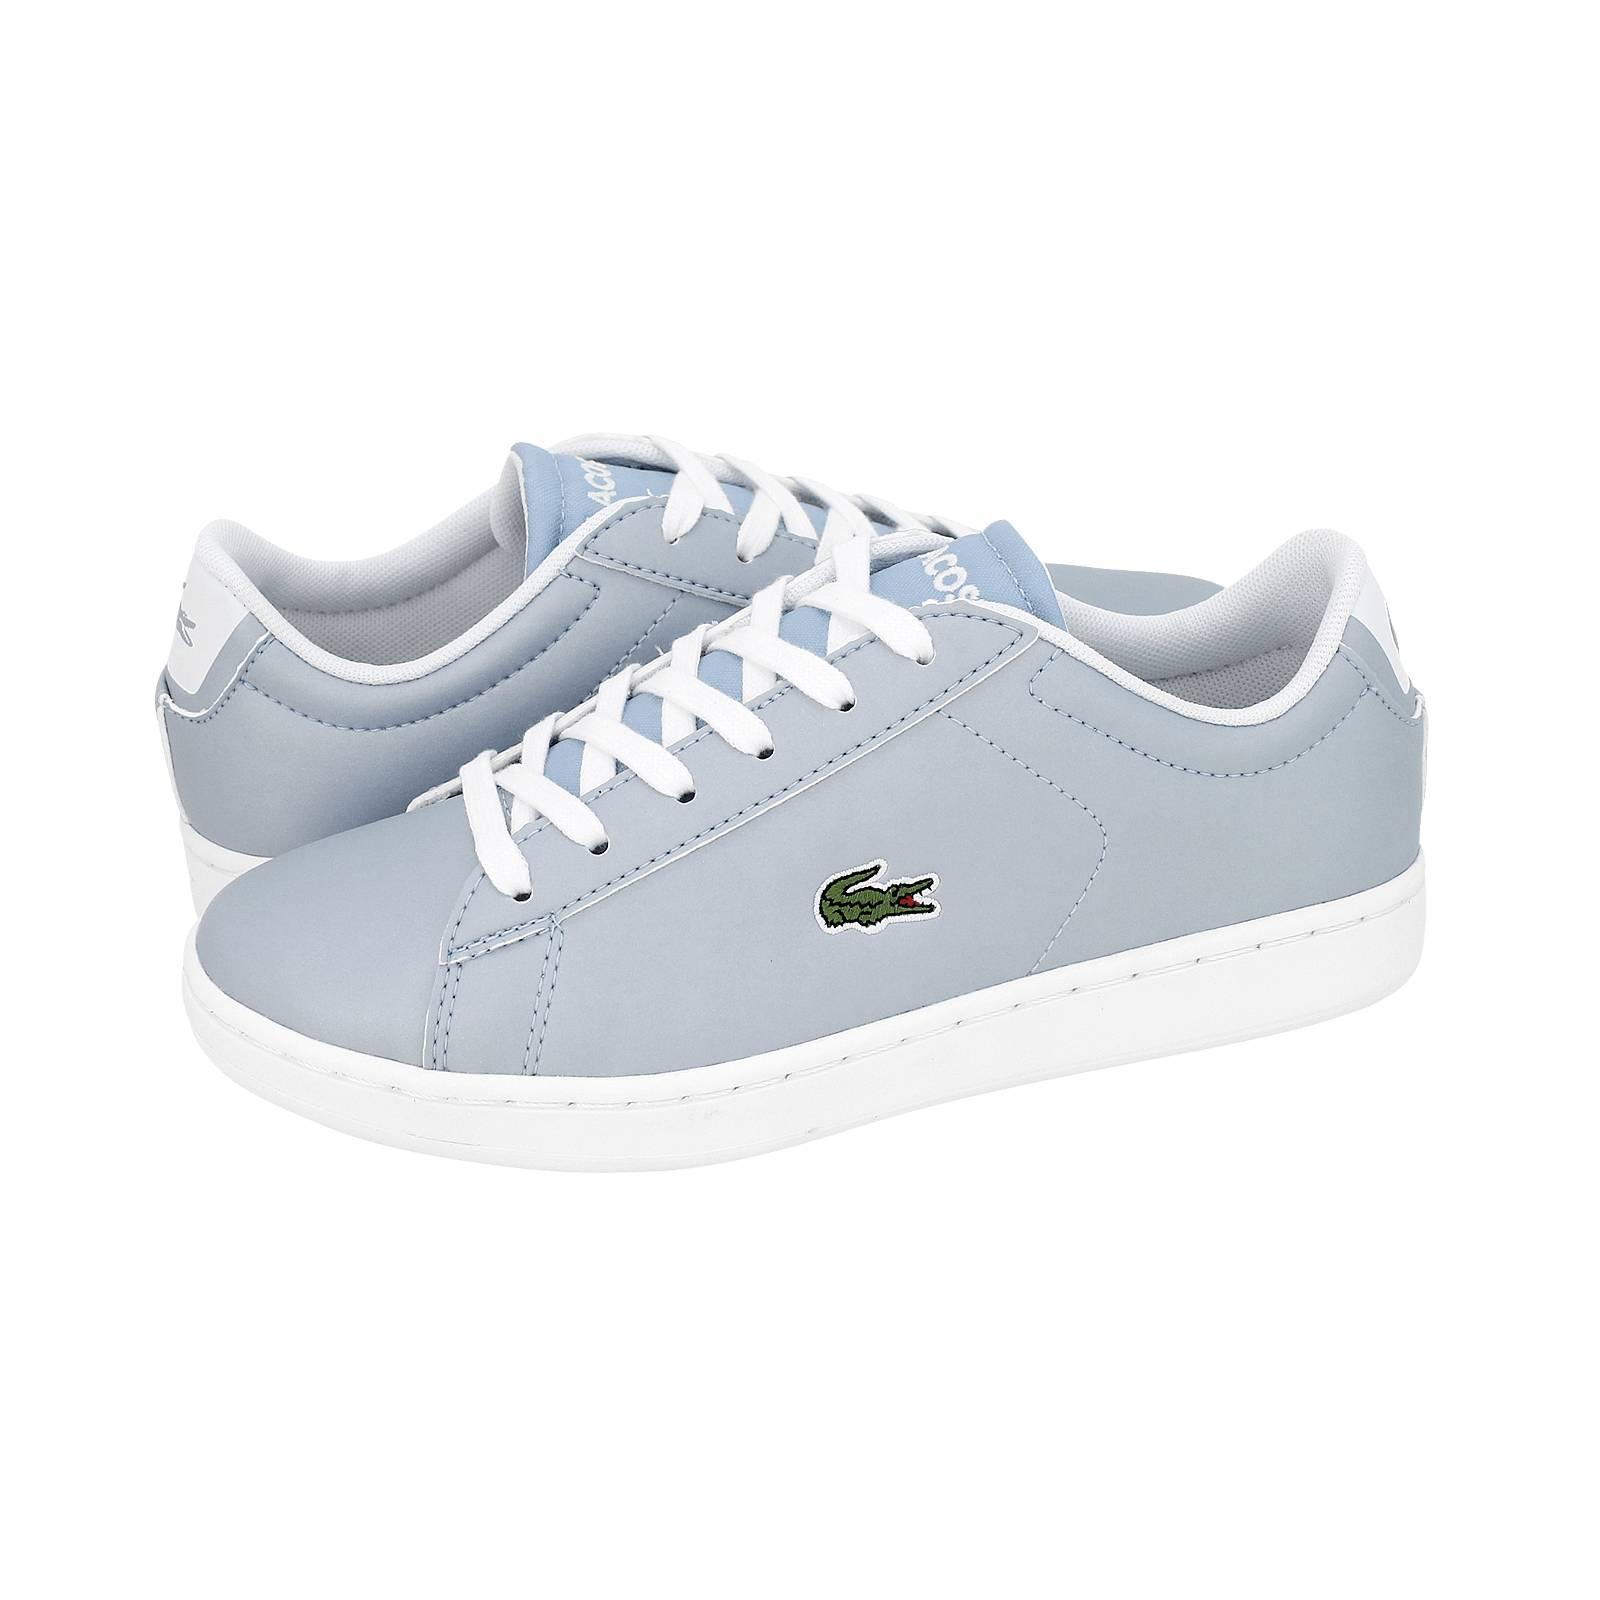 Carnaby 317 - Παιδικά παπούτσια casual Lacoste από δερμα συνθετικο ... be873f2e920